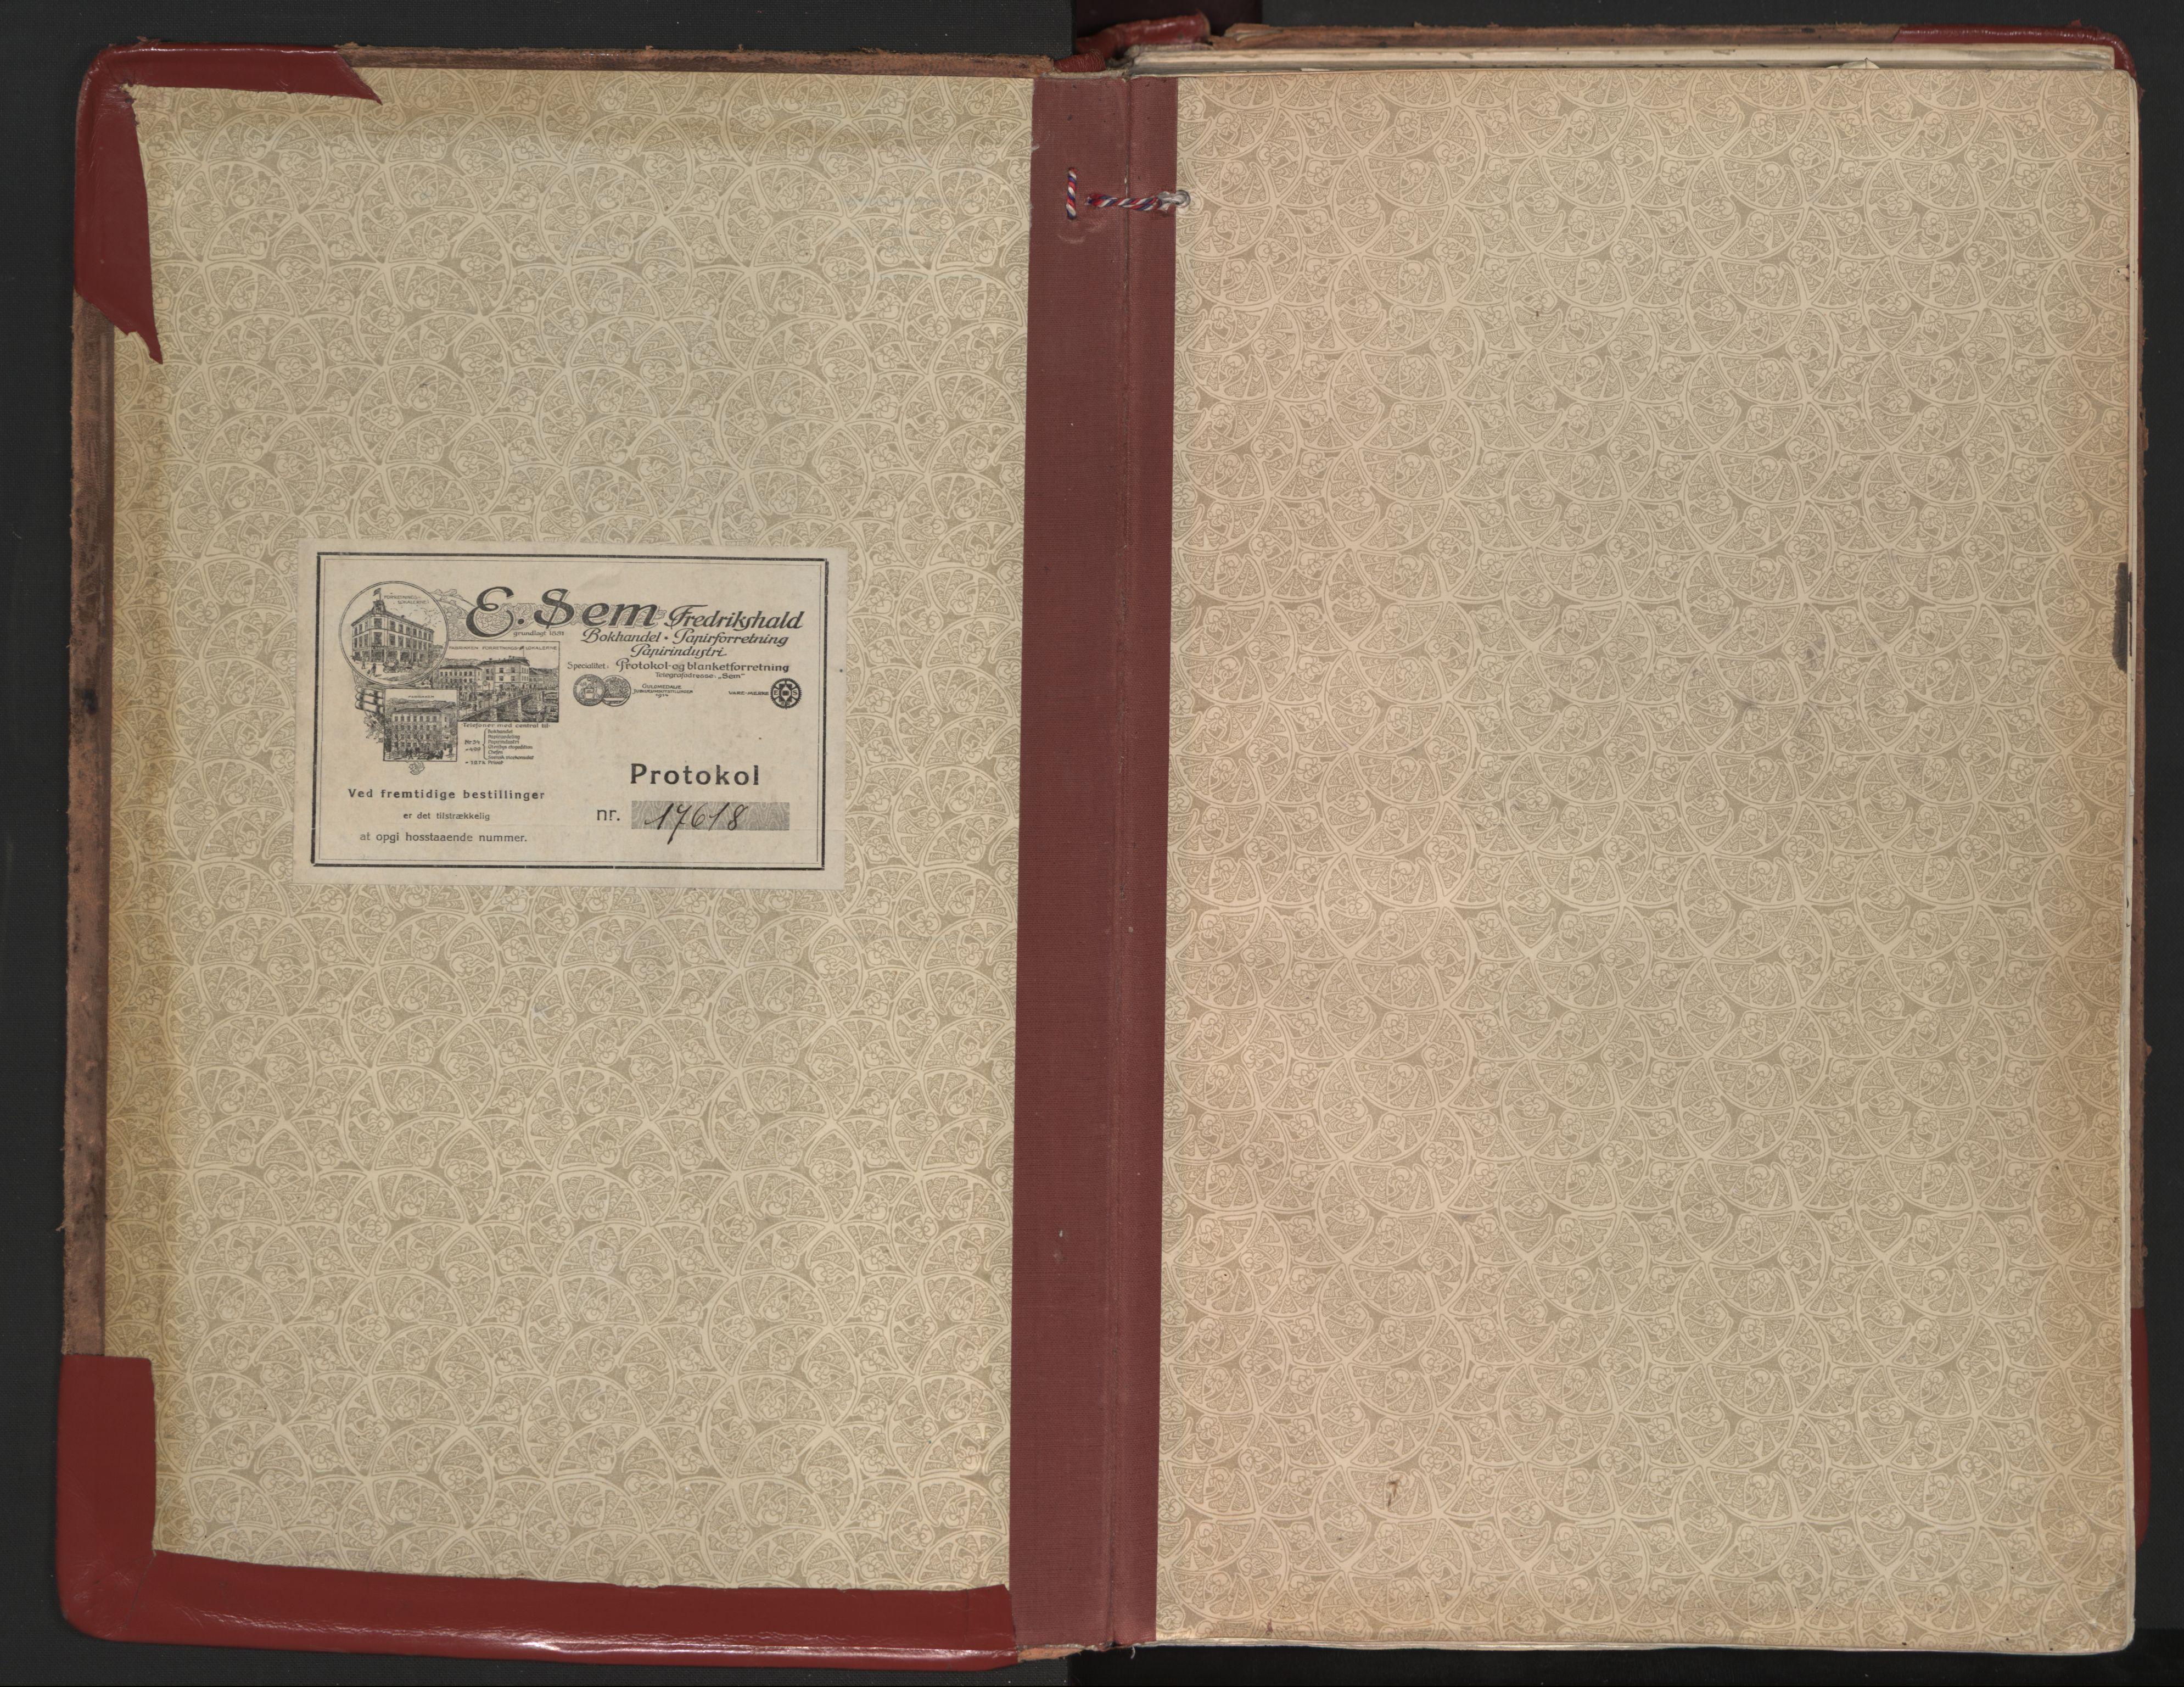 SAT, Ministerialprotokoller, klokkerbøker og fødselsregistre - Nordland, 801/L0017: Ministerialbok nr. 801A17, 1917-1930